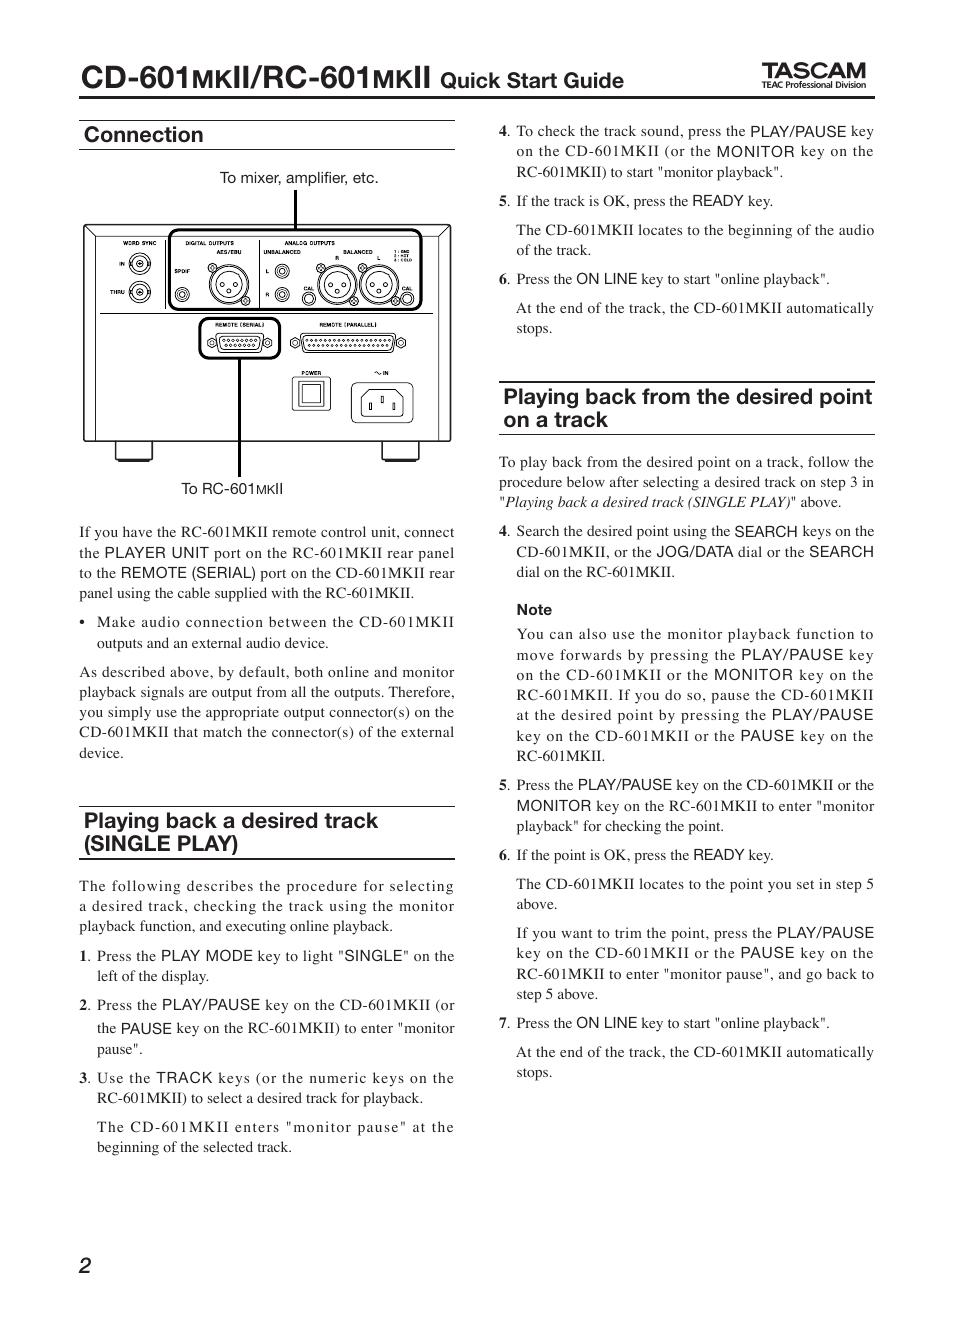 Tascam cd-601-mkii cd player on demand pdf download | spanish.